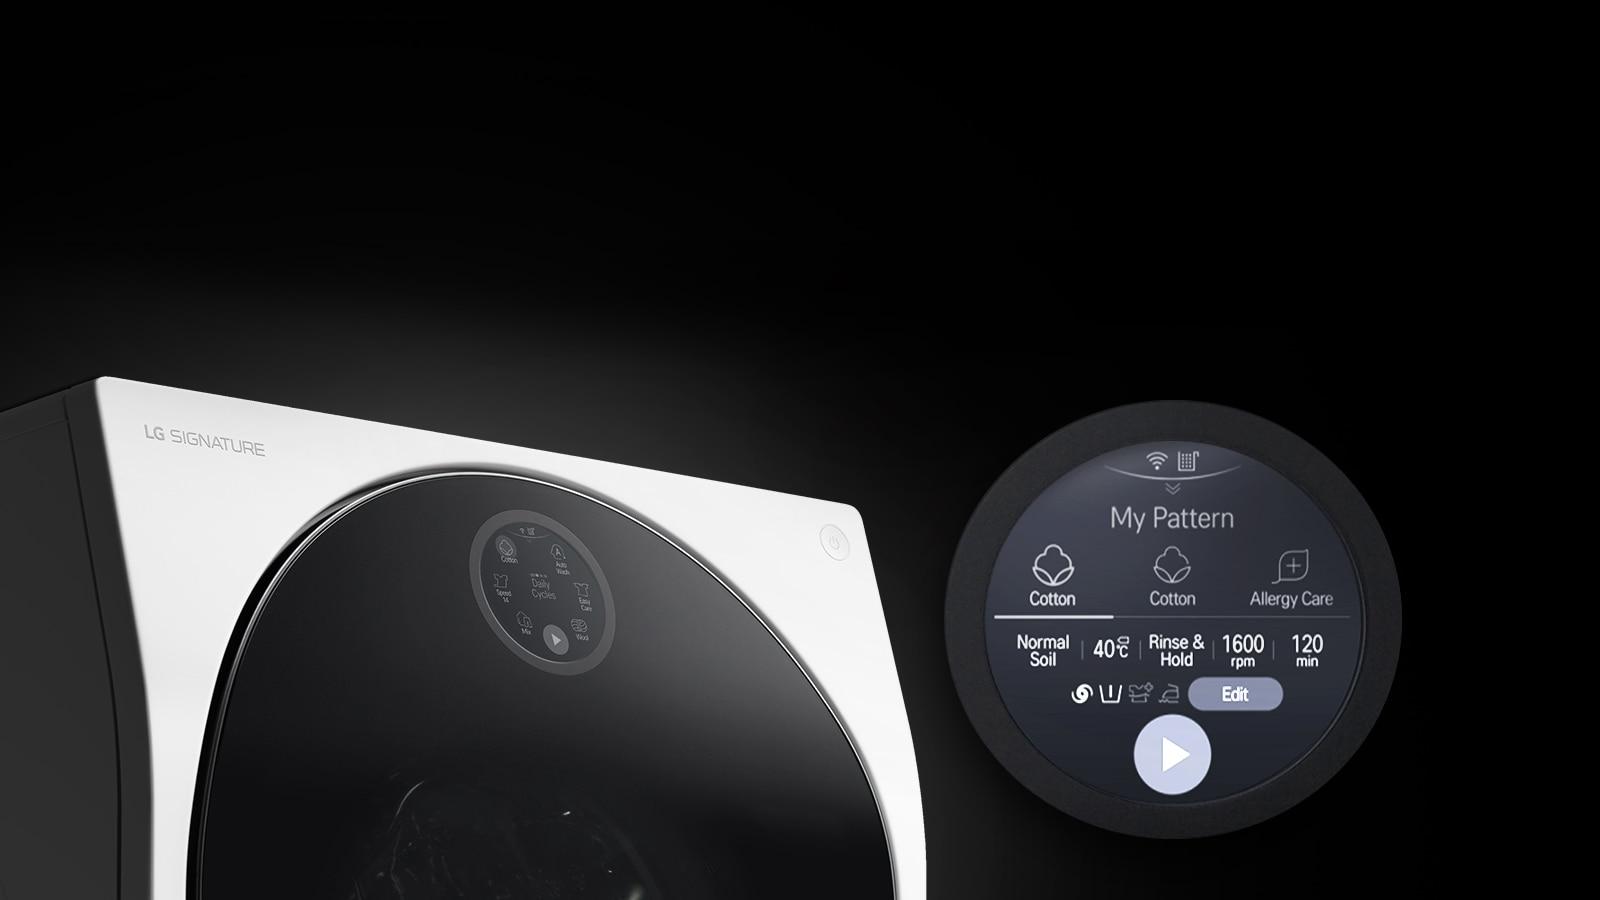 lg signature twinwash waschmaschine lsf100w 12 kg mini waschmaschine lst100 2 kg. Black Bedroom Furniture Sets. Home Design Ideas